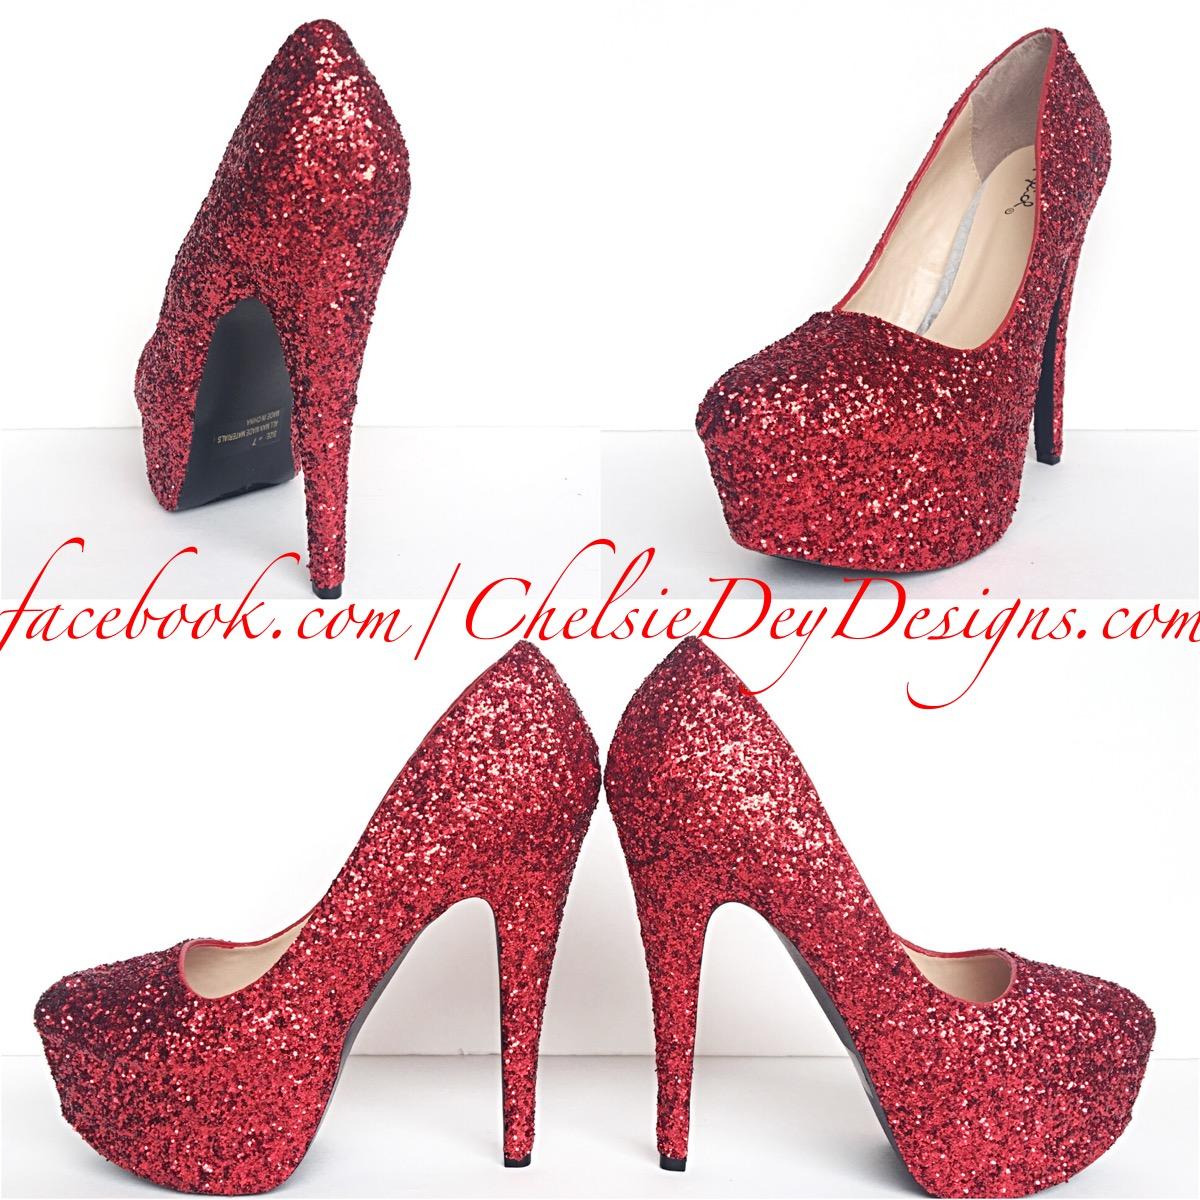 fa0c21d704fe Red Glitter High Heels